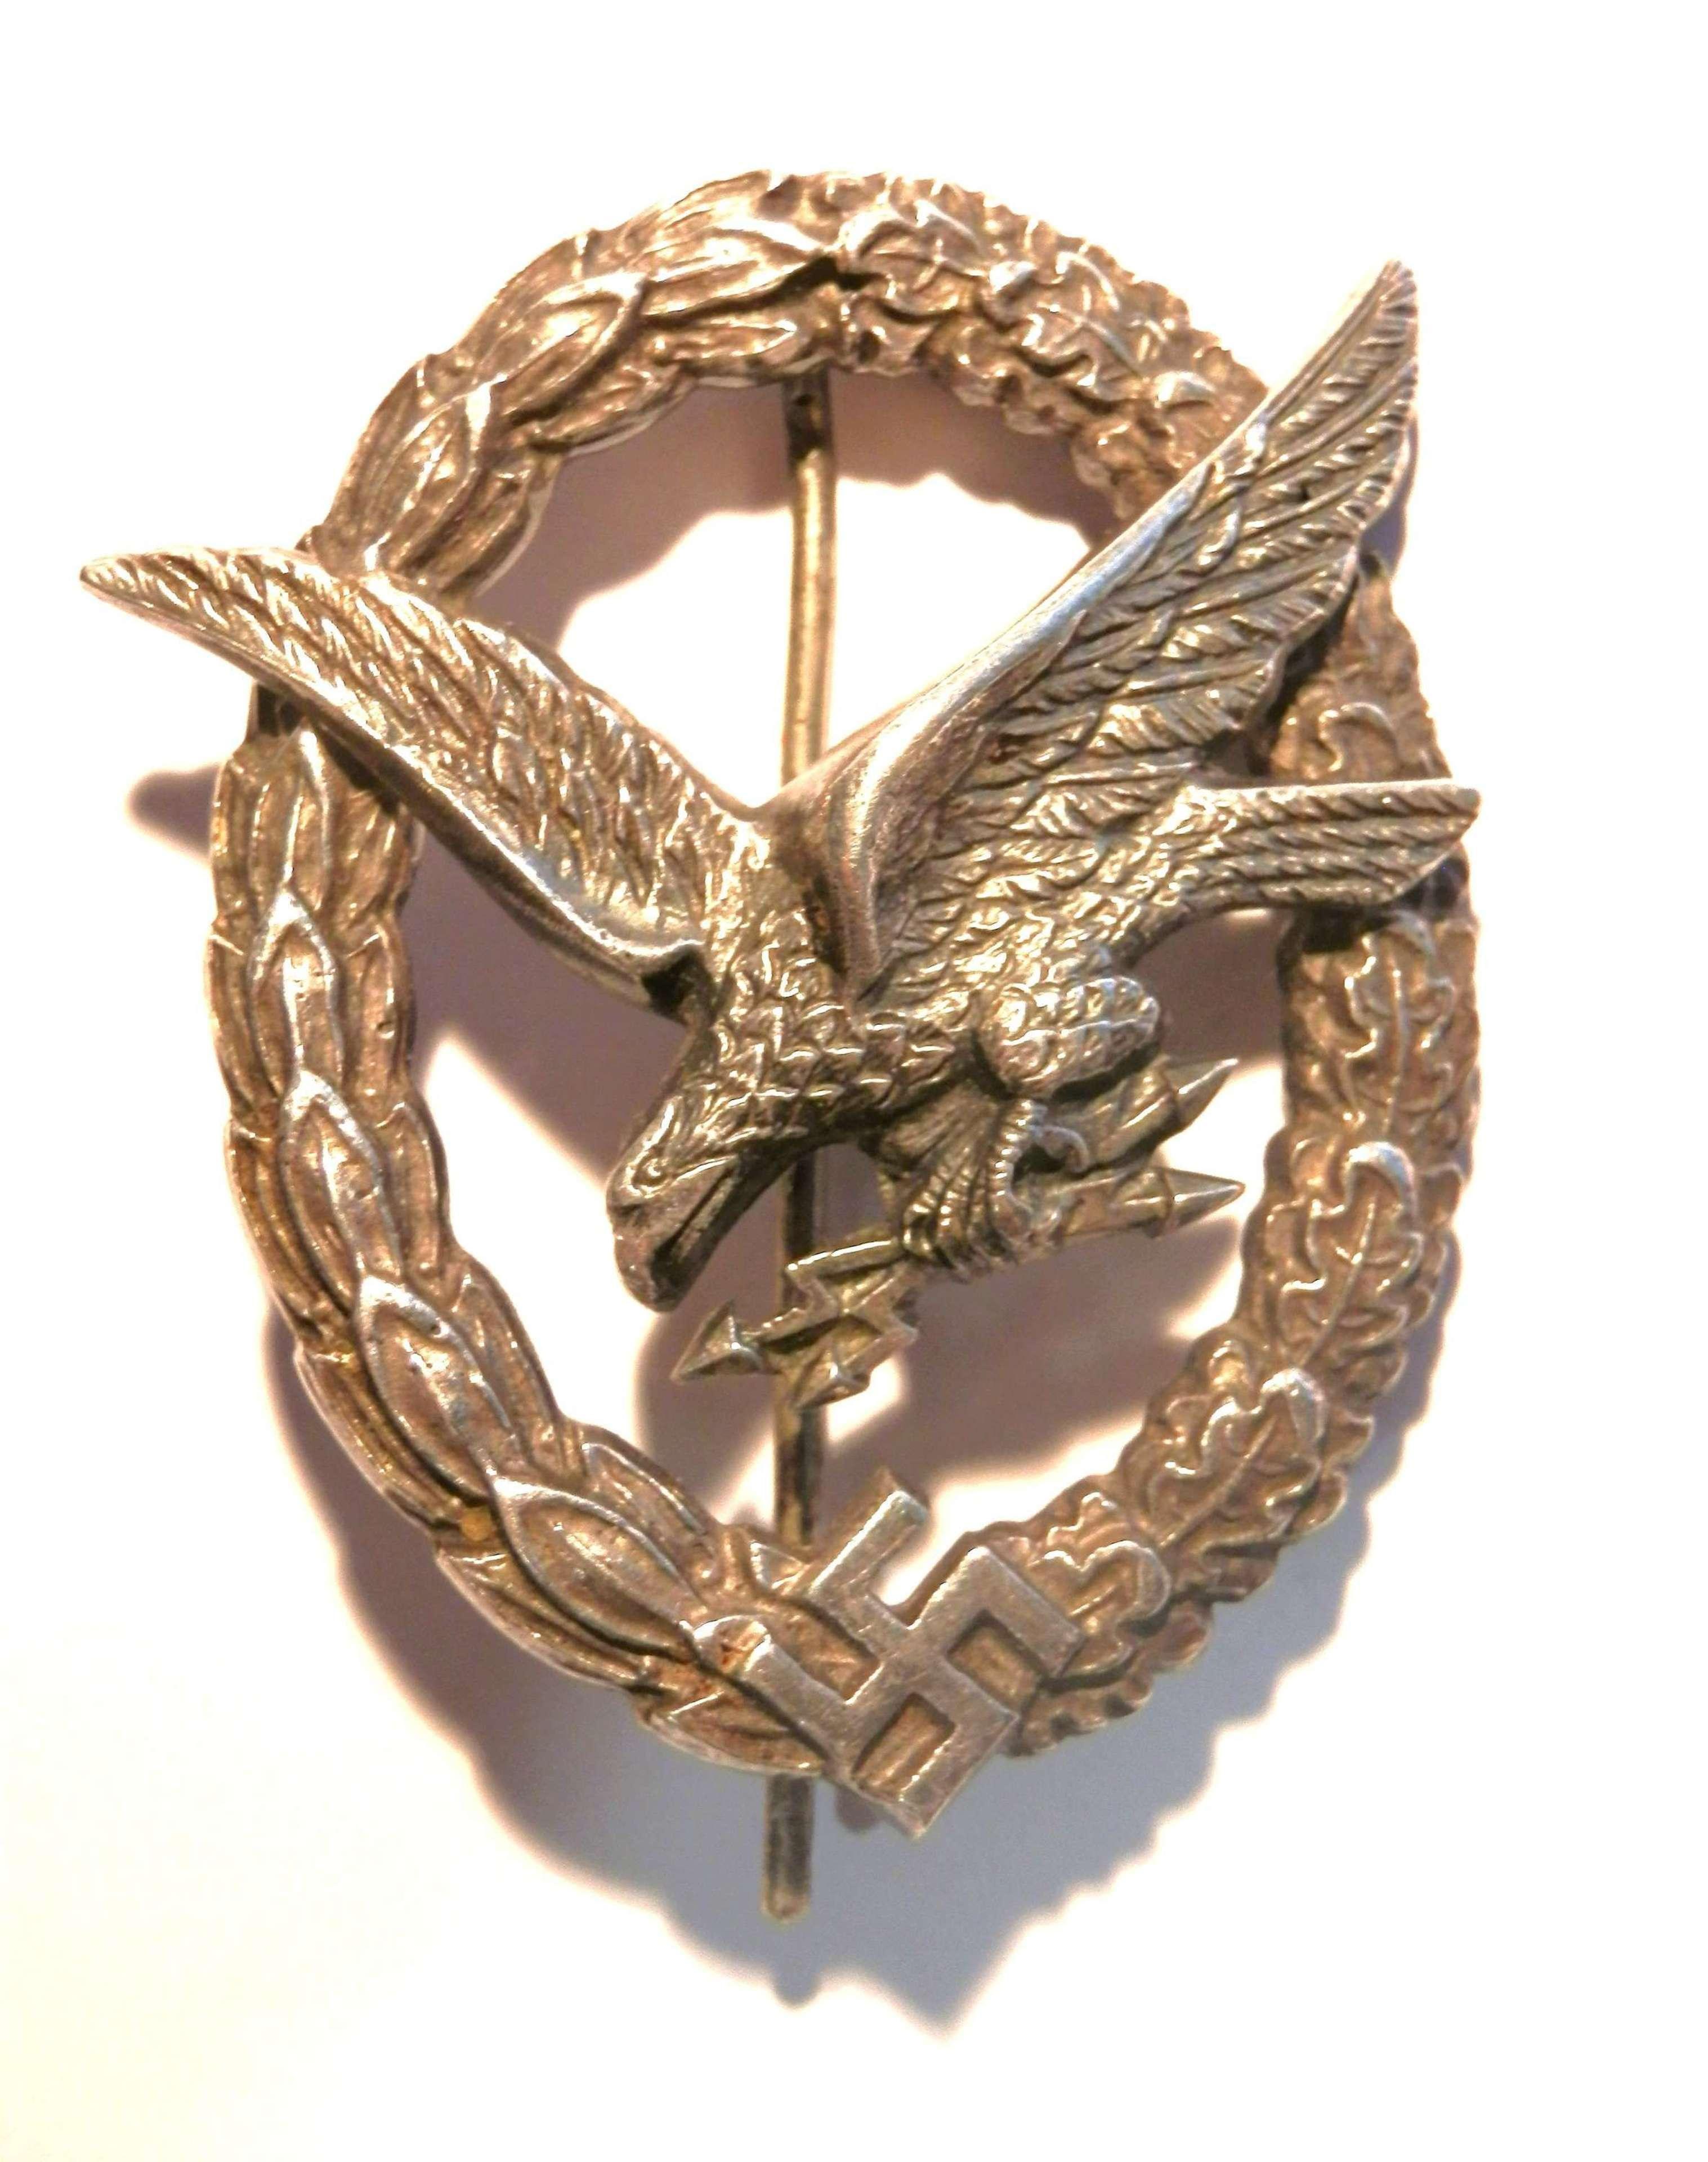 Luftwaffe Radio Operator/Air Gunner's Badge.